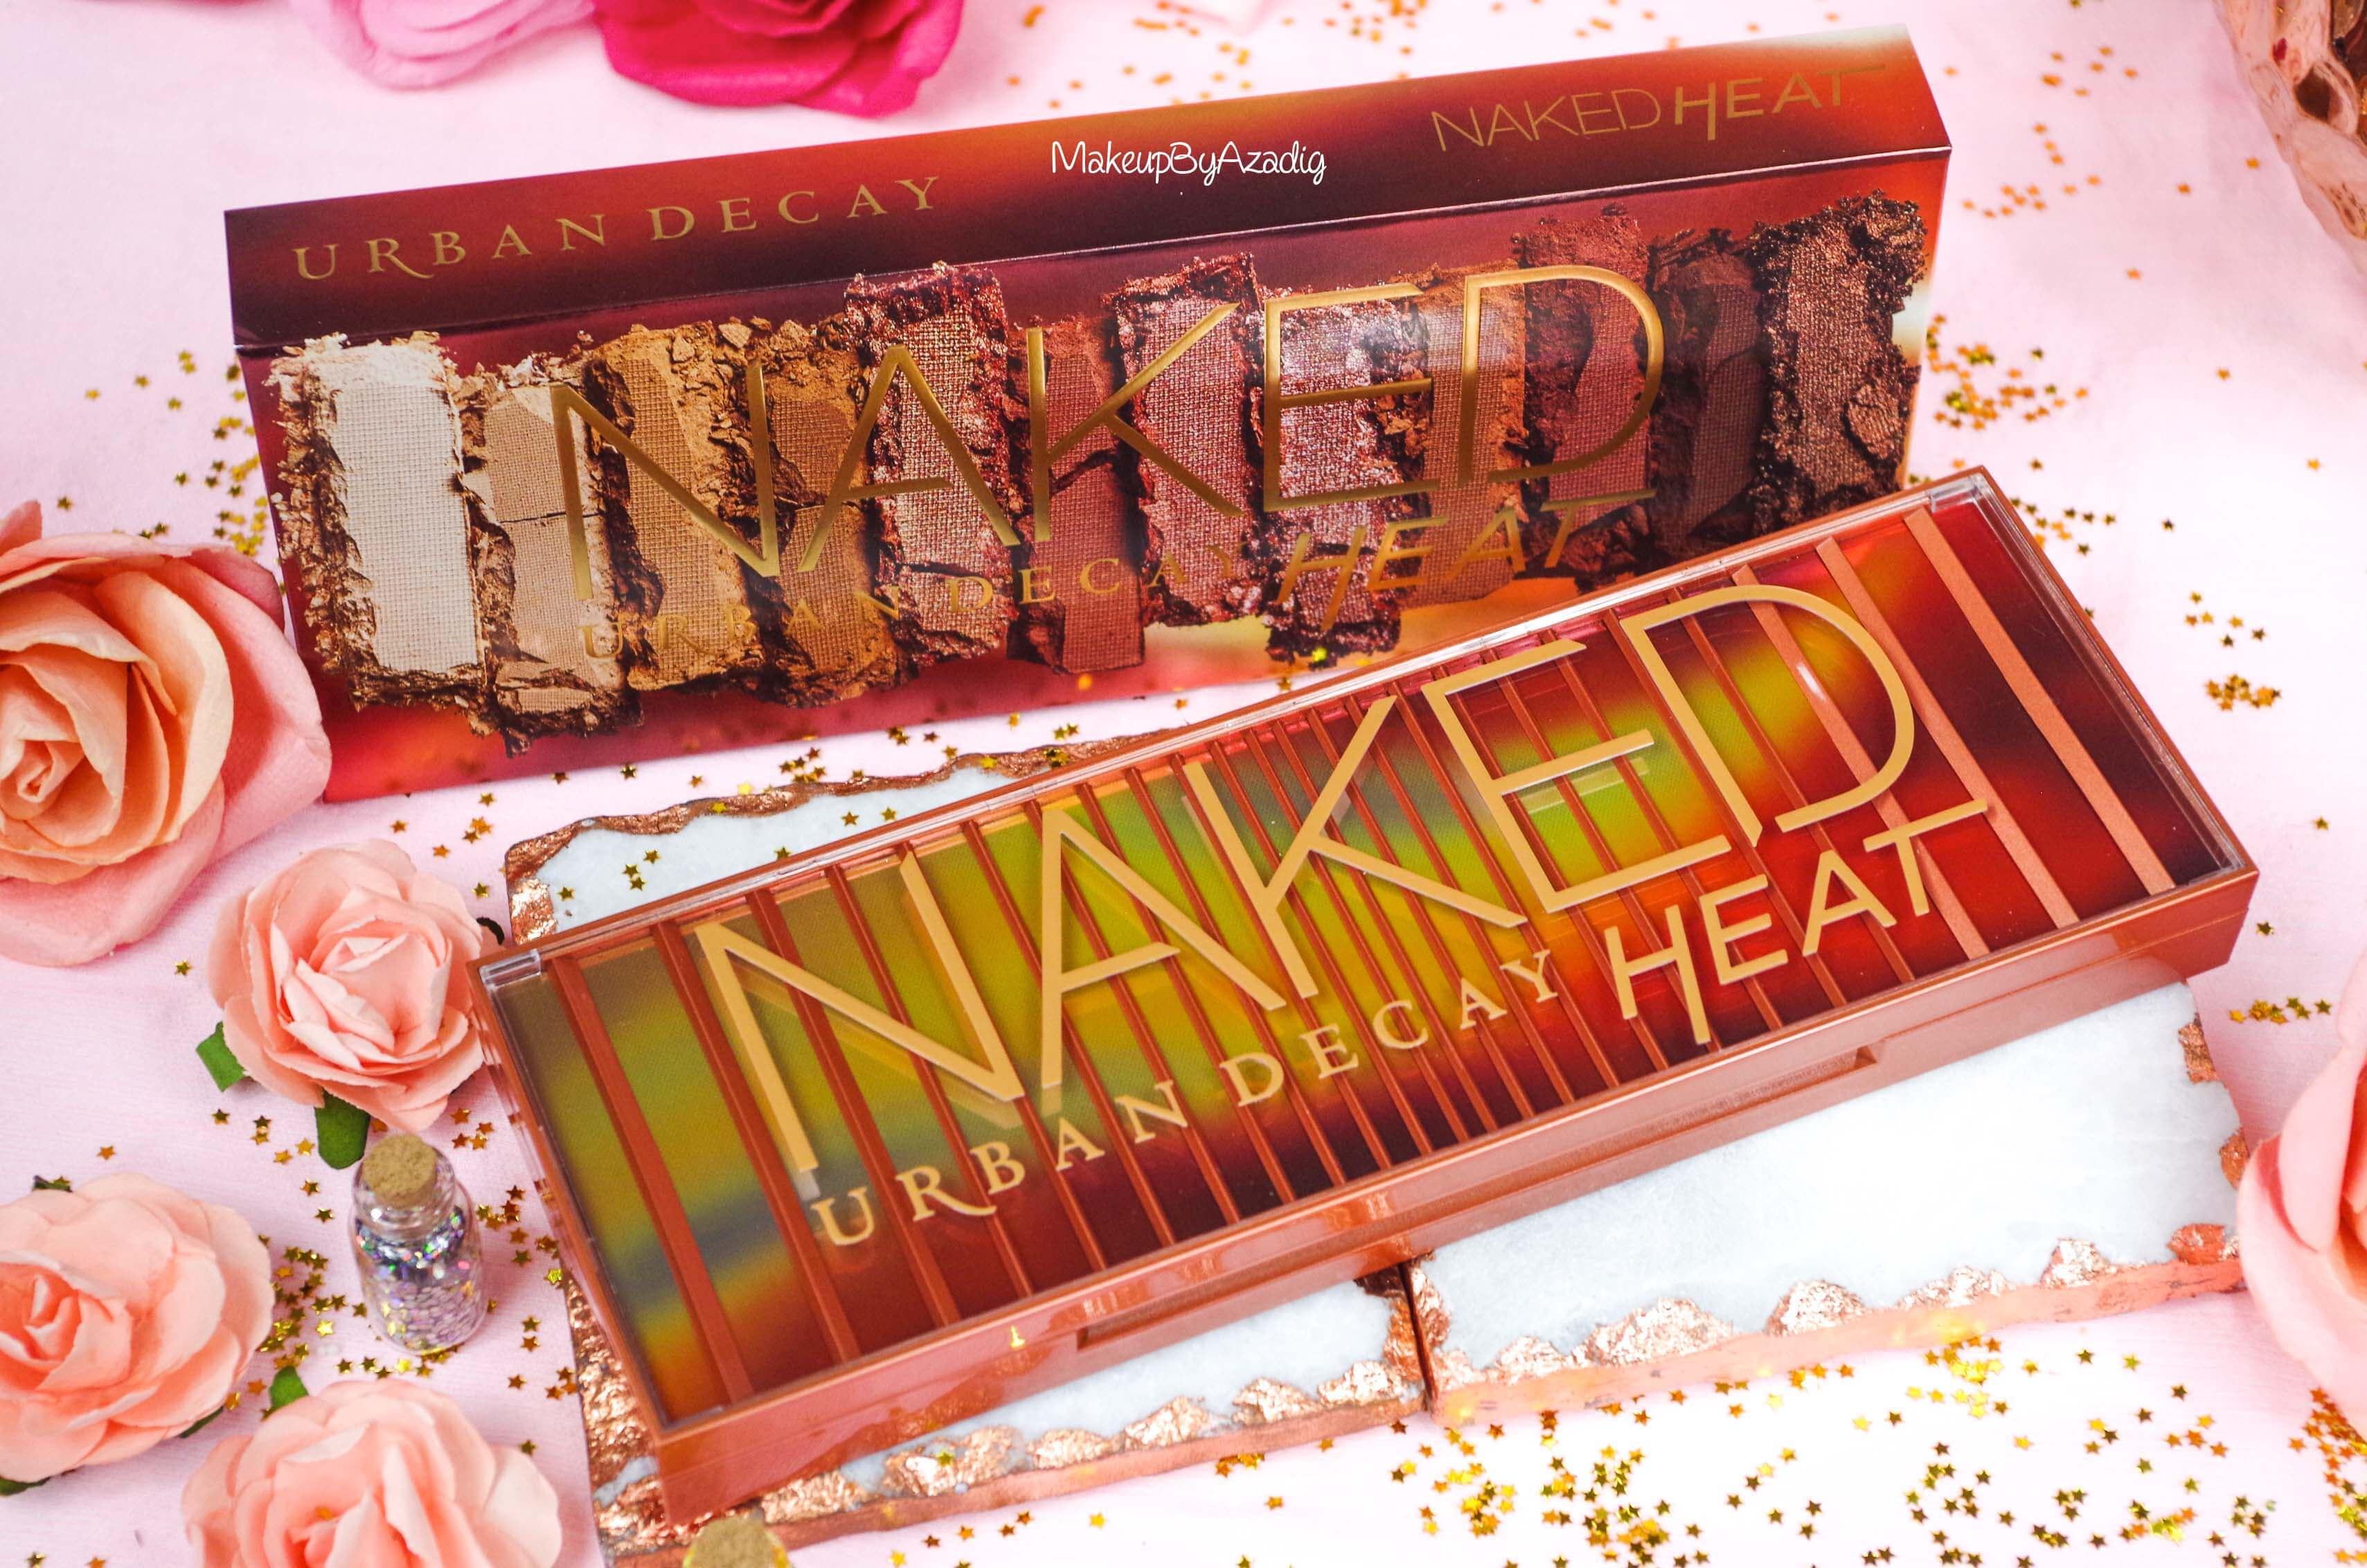 revue-review-nouvelle-palette-naked-heat-urban-decay-sephora-avis-prix-france-makeupbyazadig-swatch-chauds